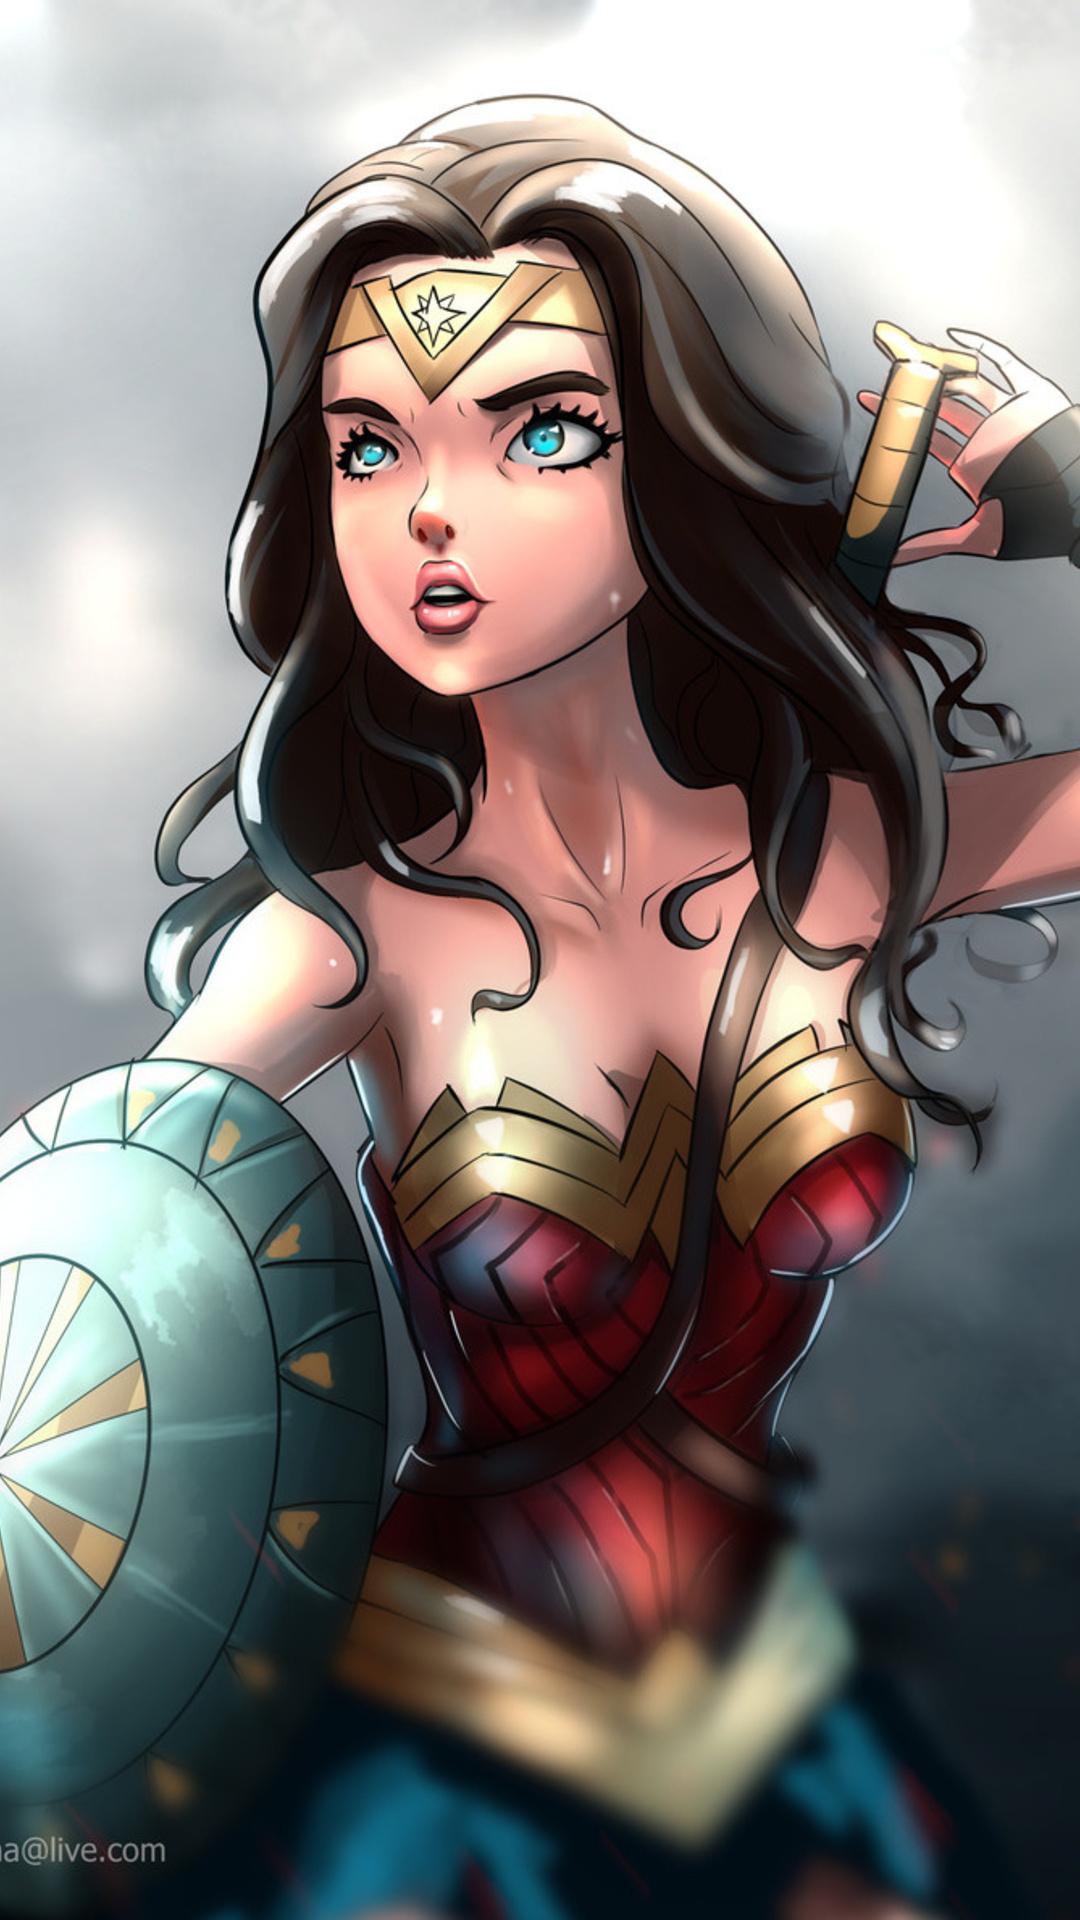 Padded Walls 1080x1920 Wonder Woman Cartoon Artwork Iphone 7 6s 6 Plus